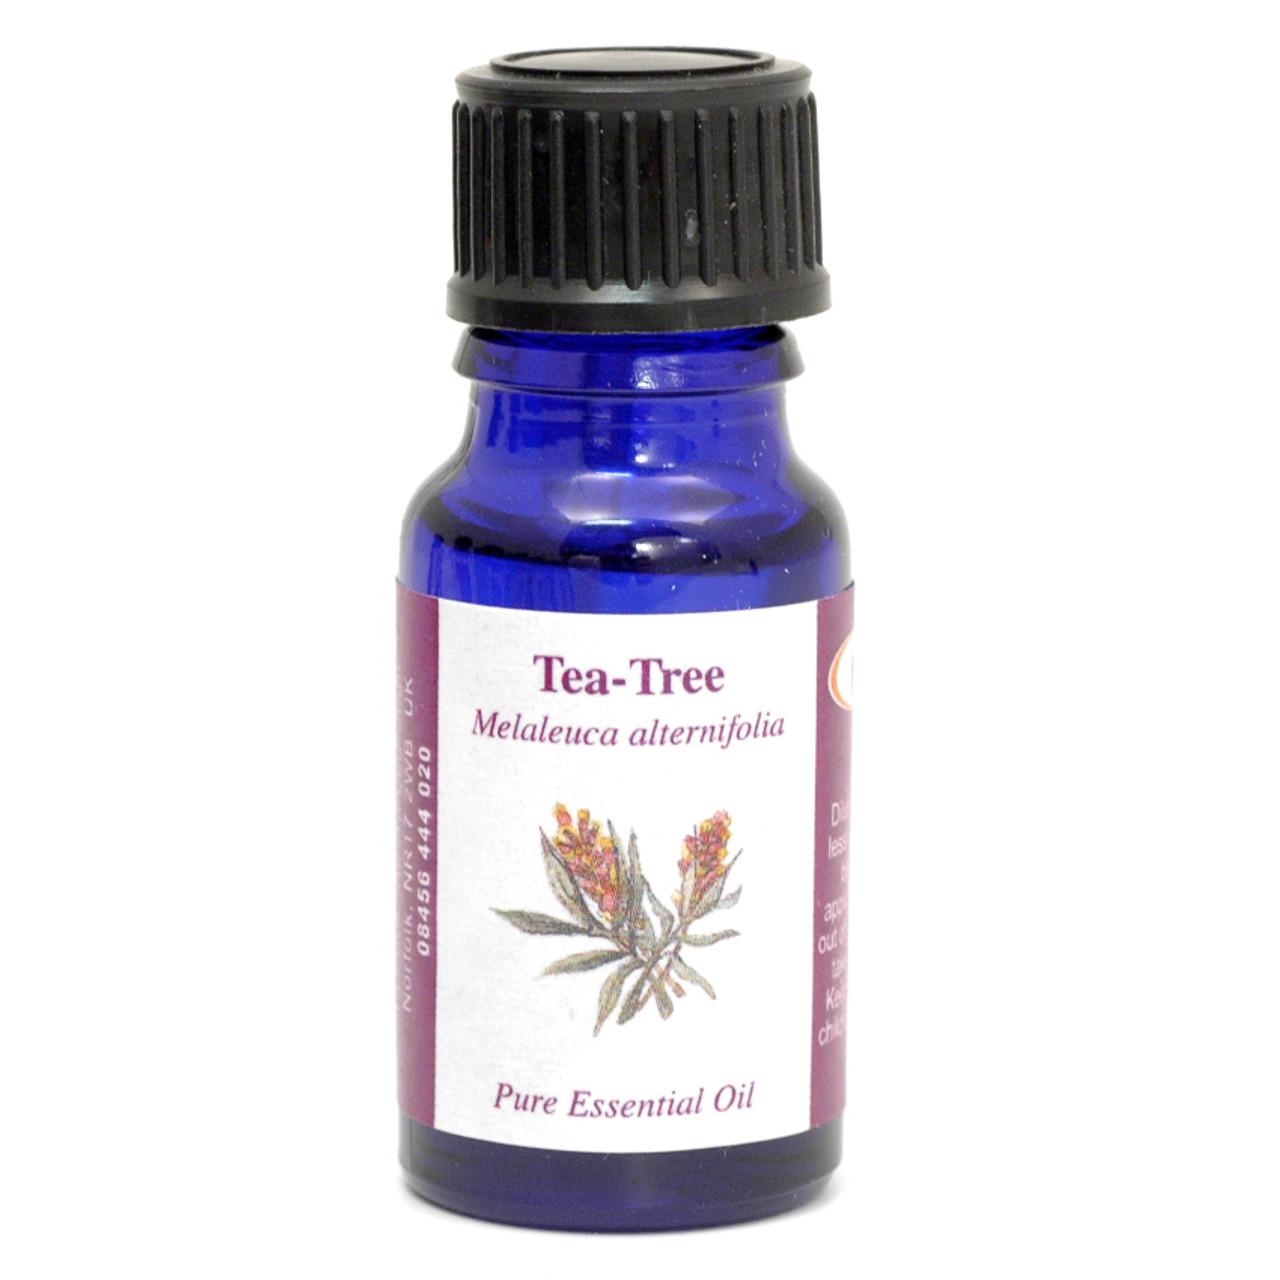 Tea Tree Essential Oil (Australia) - 10 ml (100% Pure Concentrated)